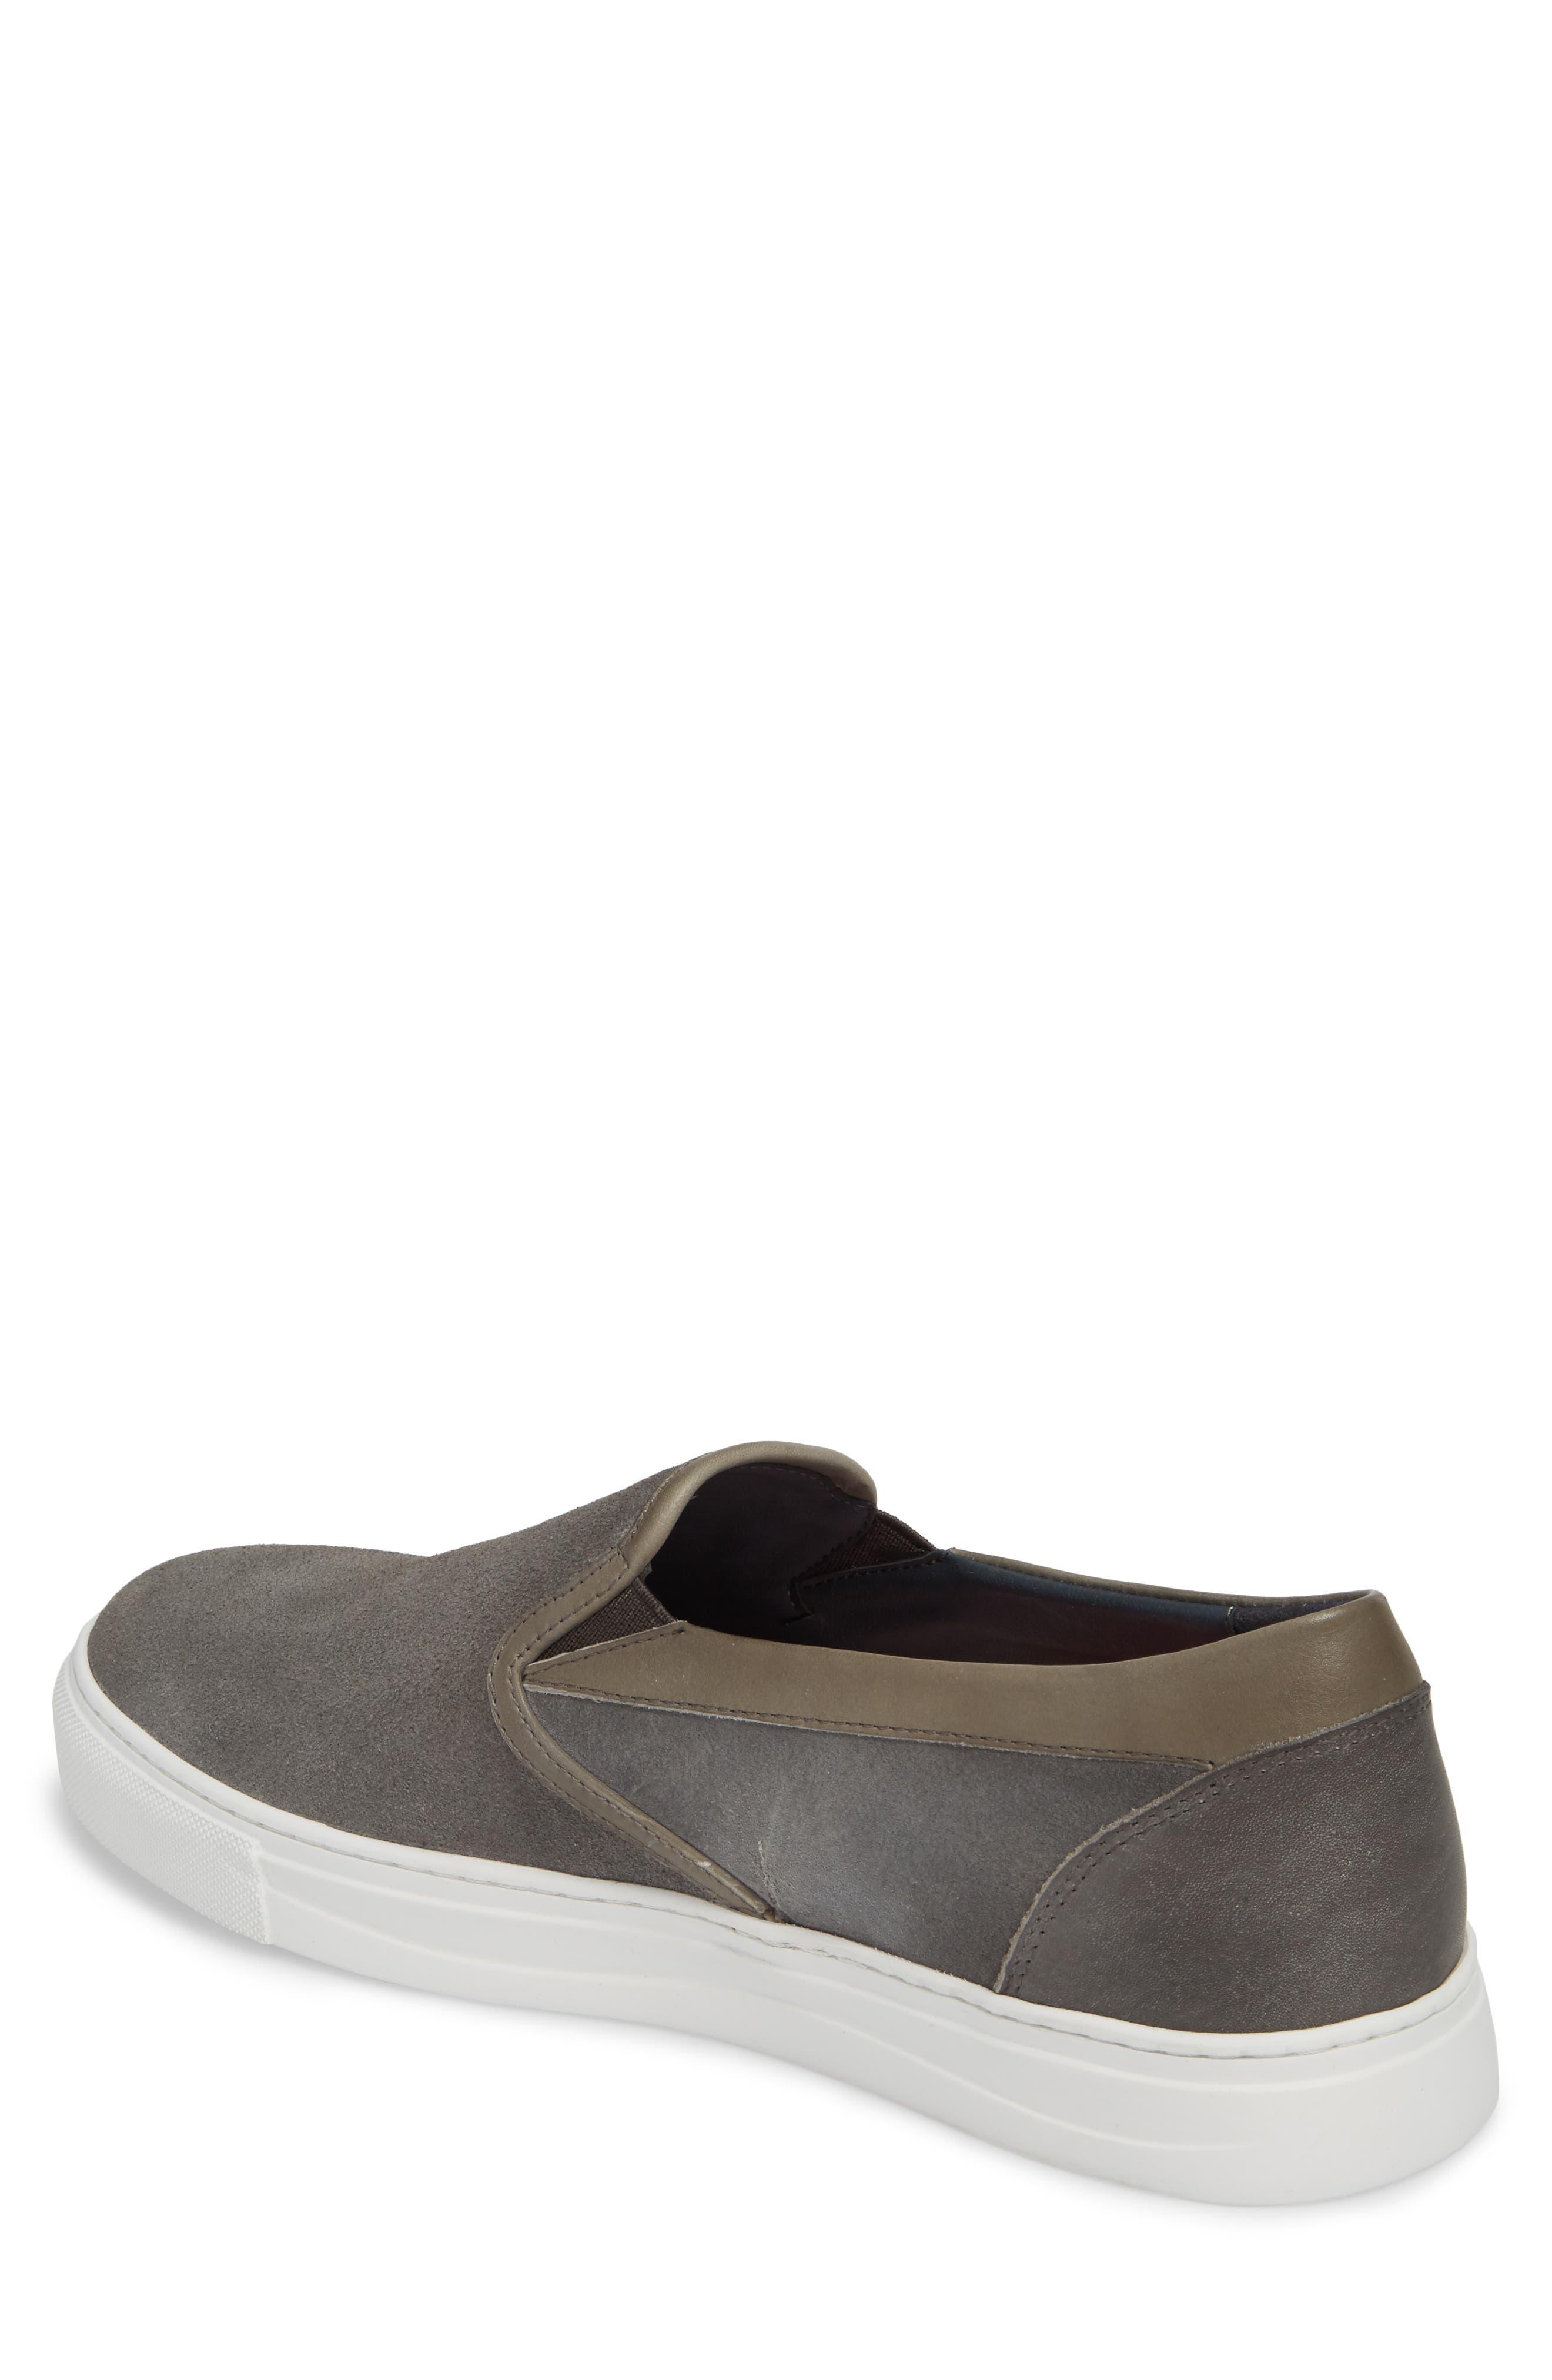 Vane Slip-On Sneaker,                             Alternate thumbnail 2, color,                             GREY SUEDE/ LEATHER